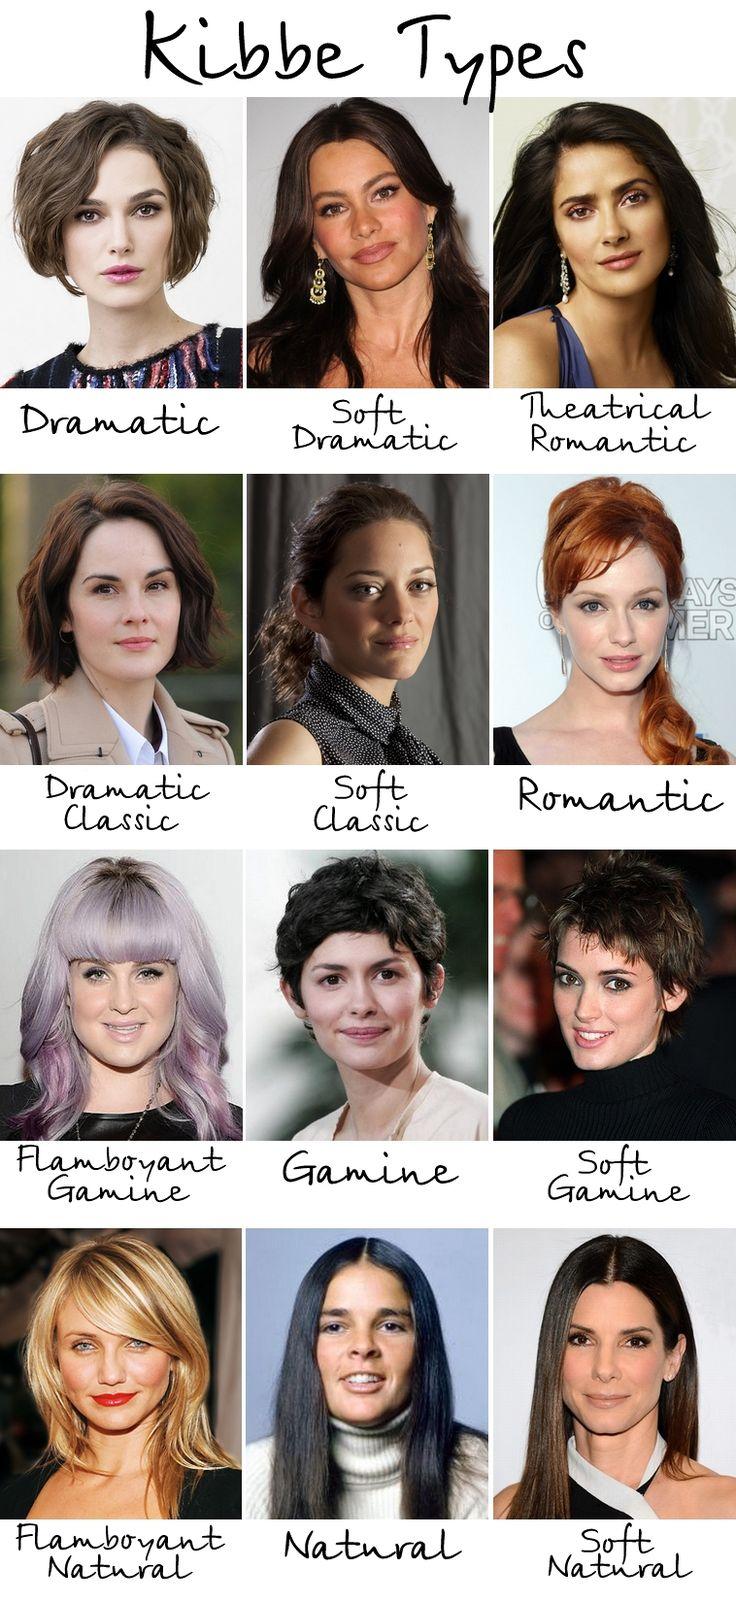 Keira Knightley (D), Sofia Vergara (SD), Salma Hayek (TR), Michelle Dockery (Not DC but D! A DC example is Olivia Munn), Marion Cotillard (SC), Christina Hendricks (R), Kelly Osbourne (FG), Audrey Tautou (G), Winona Ryder (SG), Cameron Diaz (FN), Ali MacGraw (N), Sandra Bullock (SN)